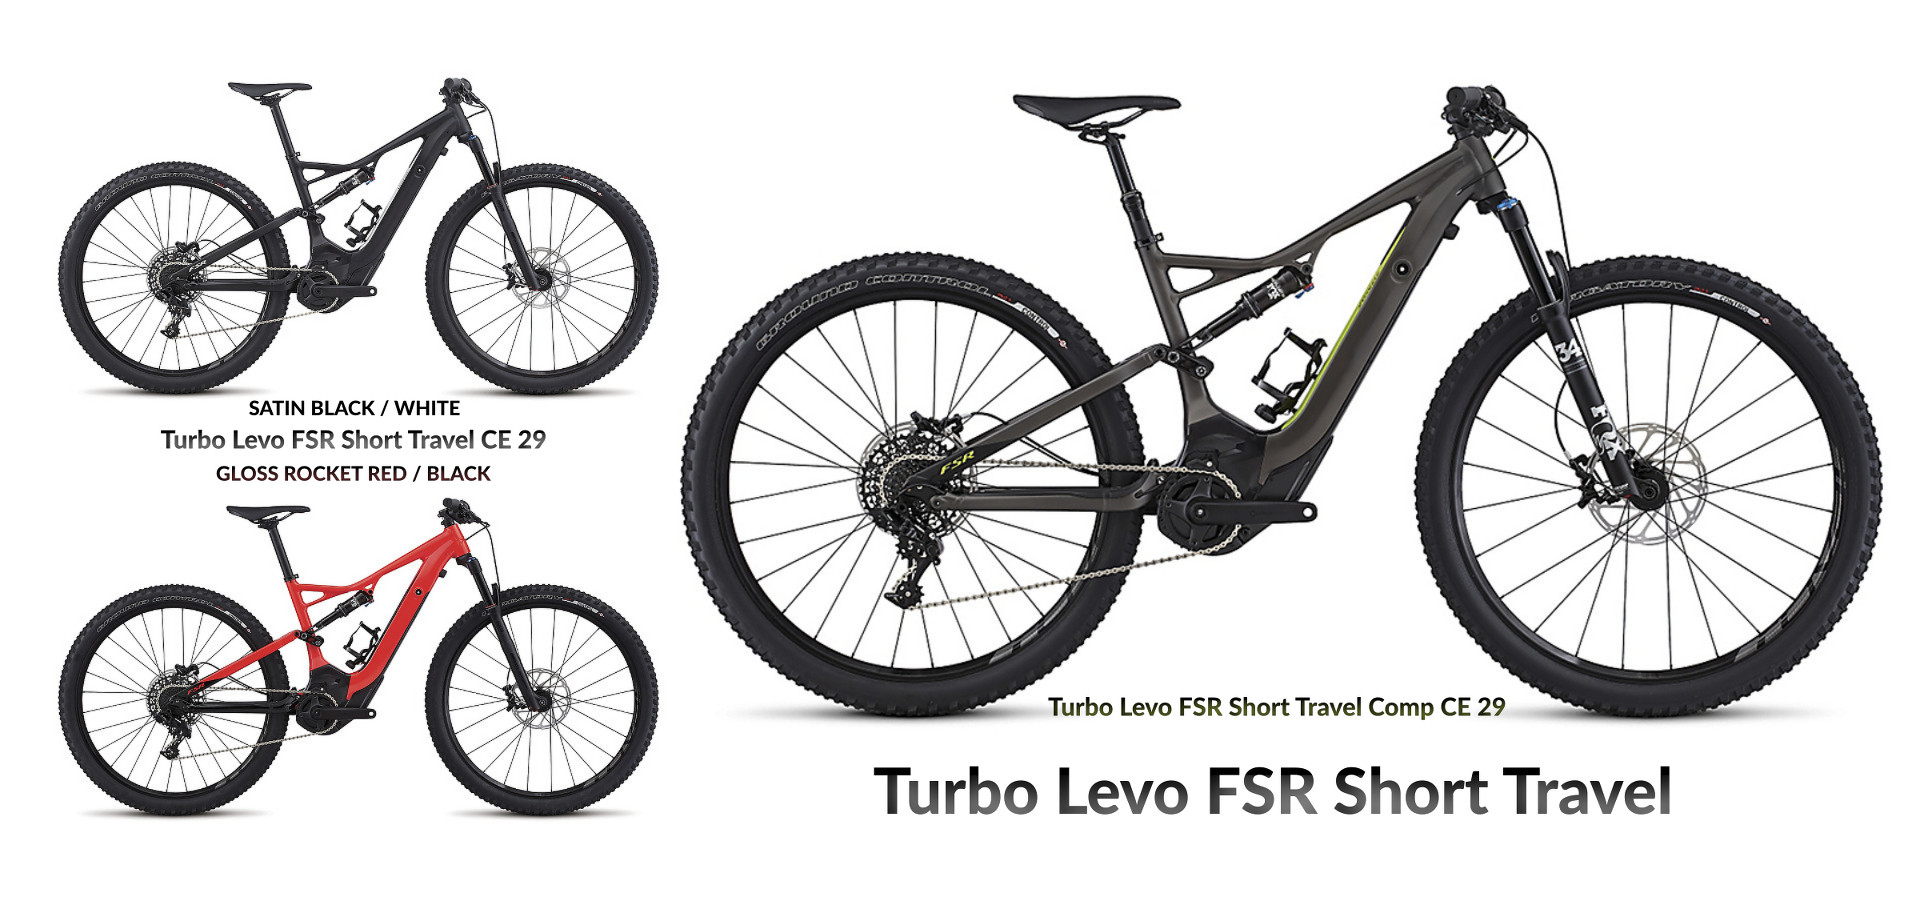 2017 Specialized Turbo Levo Short Travel Modelle